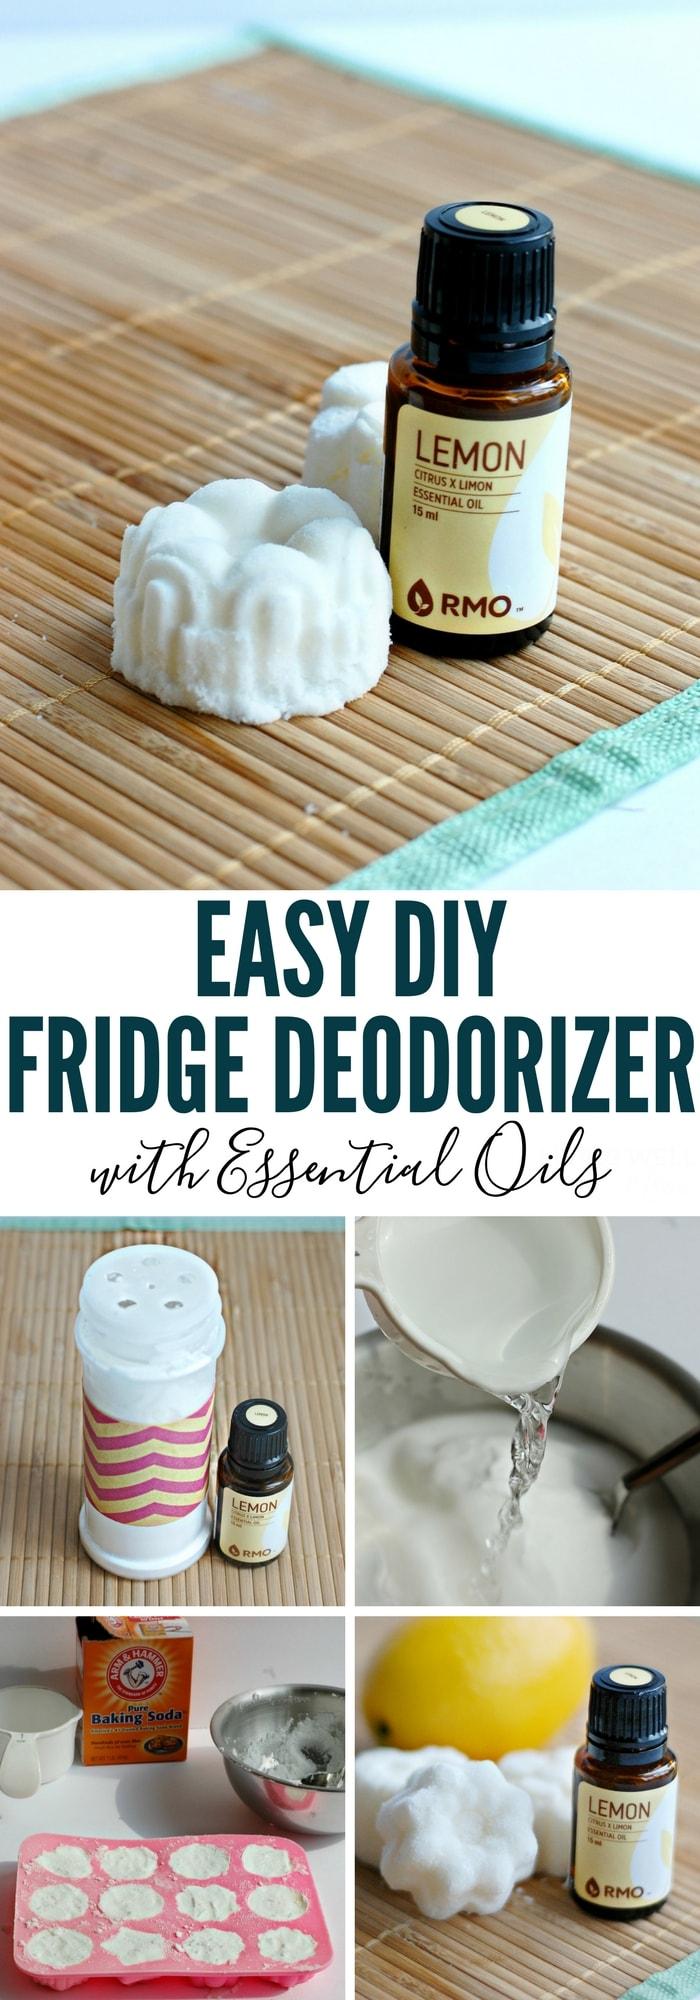 Easy Diy Fridge Deodorizer With Essential Oils